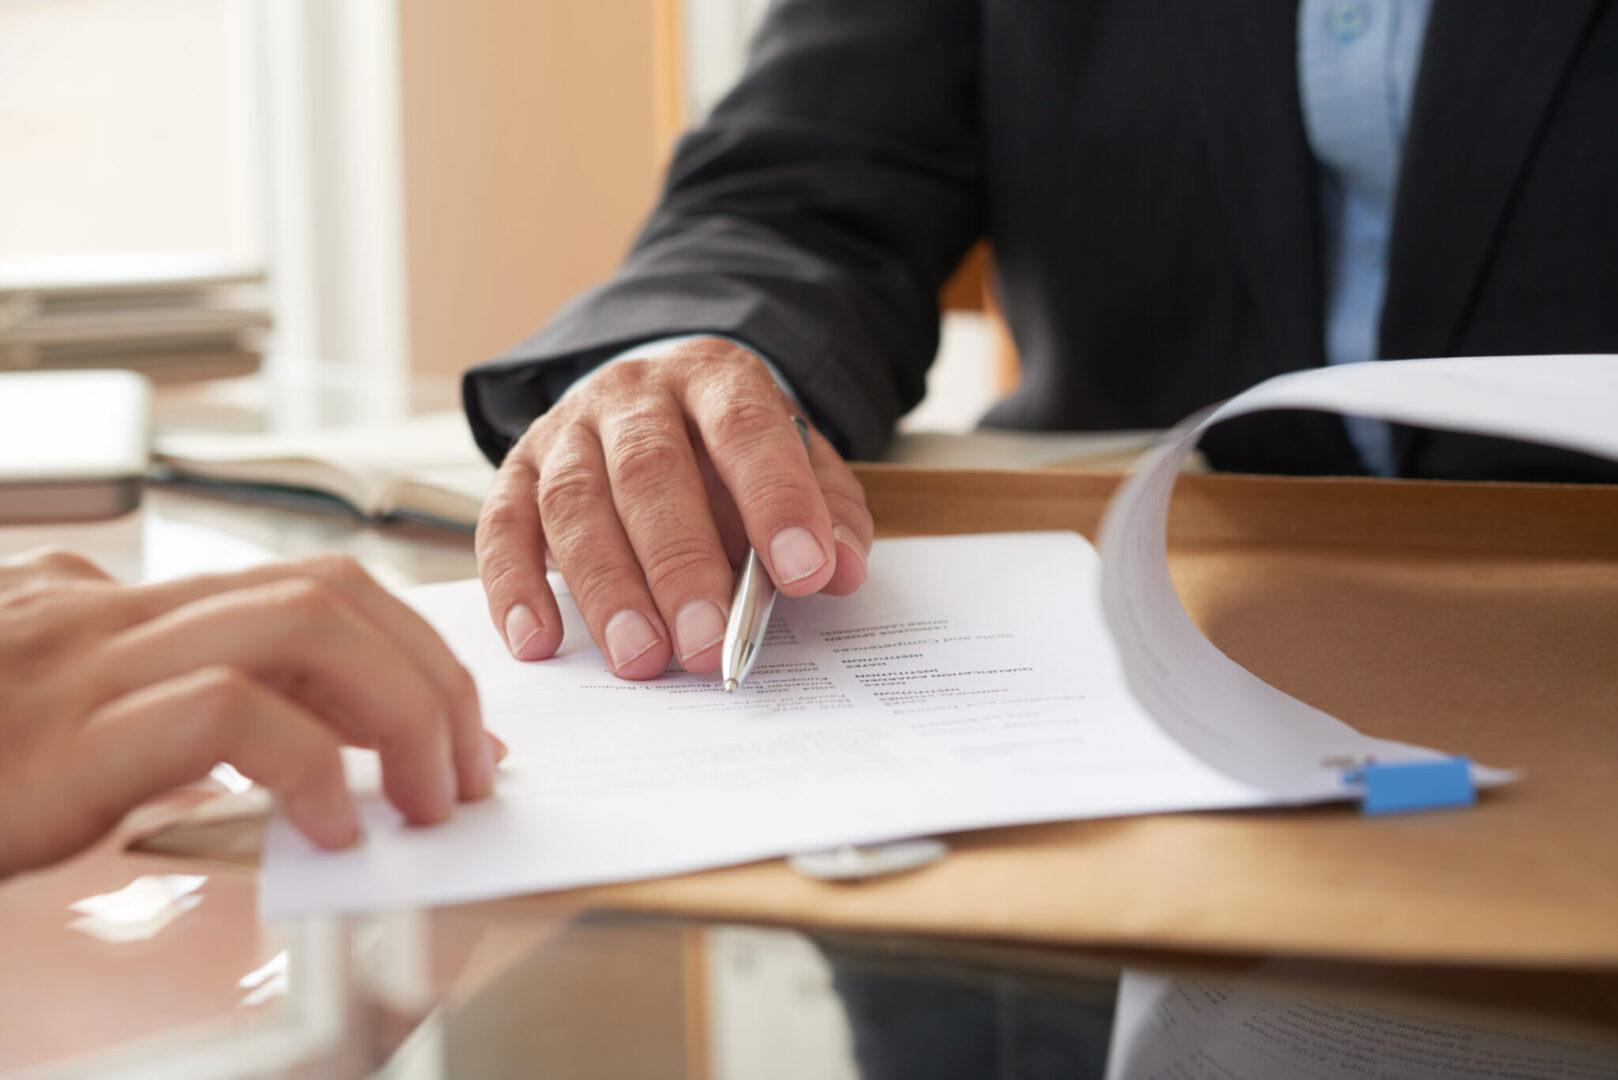 Tribunal Regional Federal valida busca de provas pela defesa